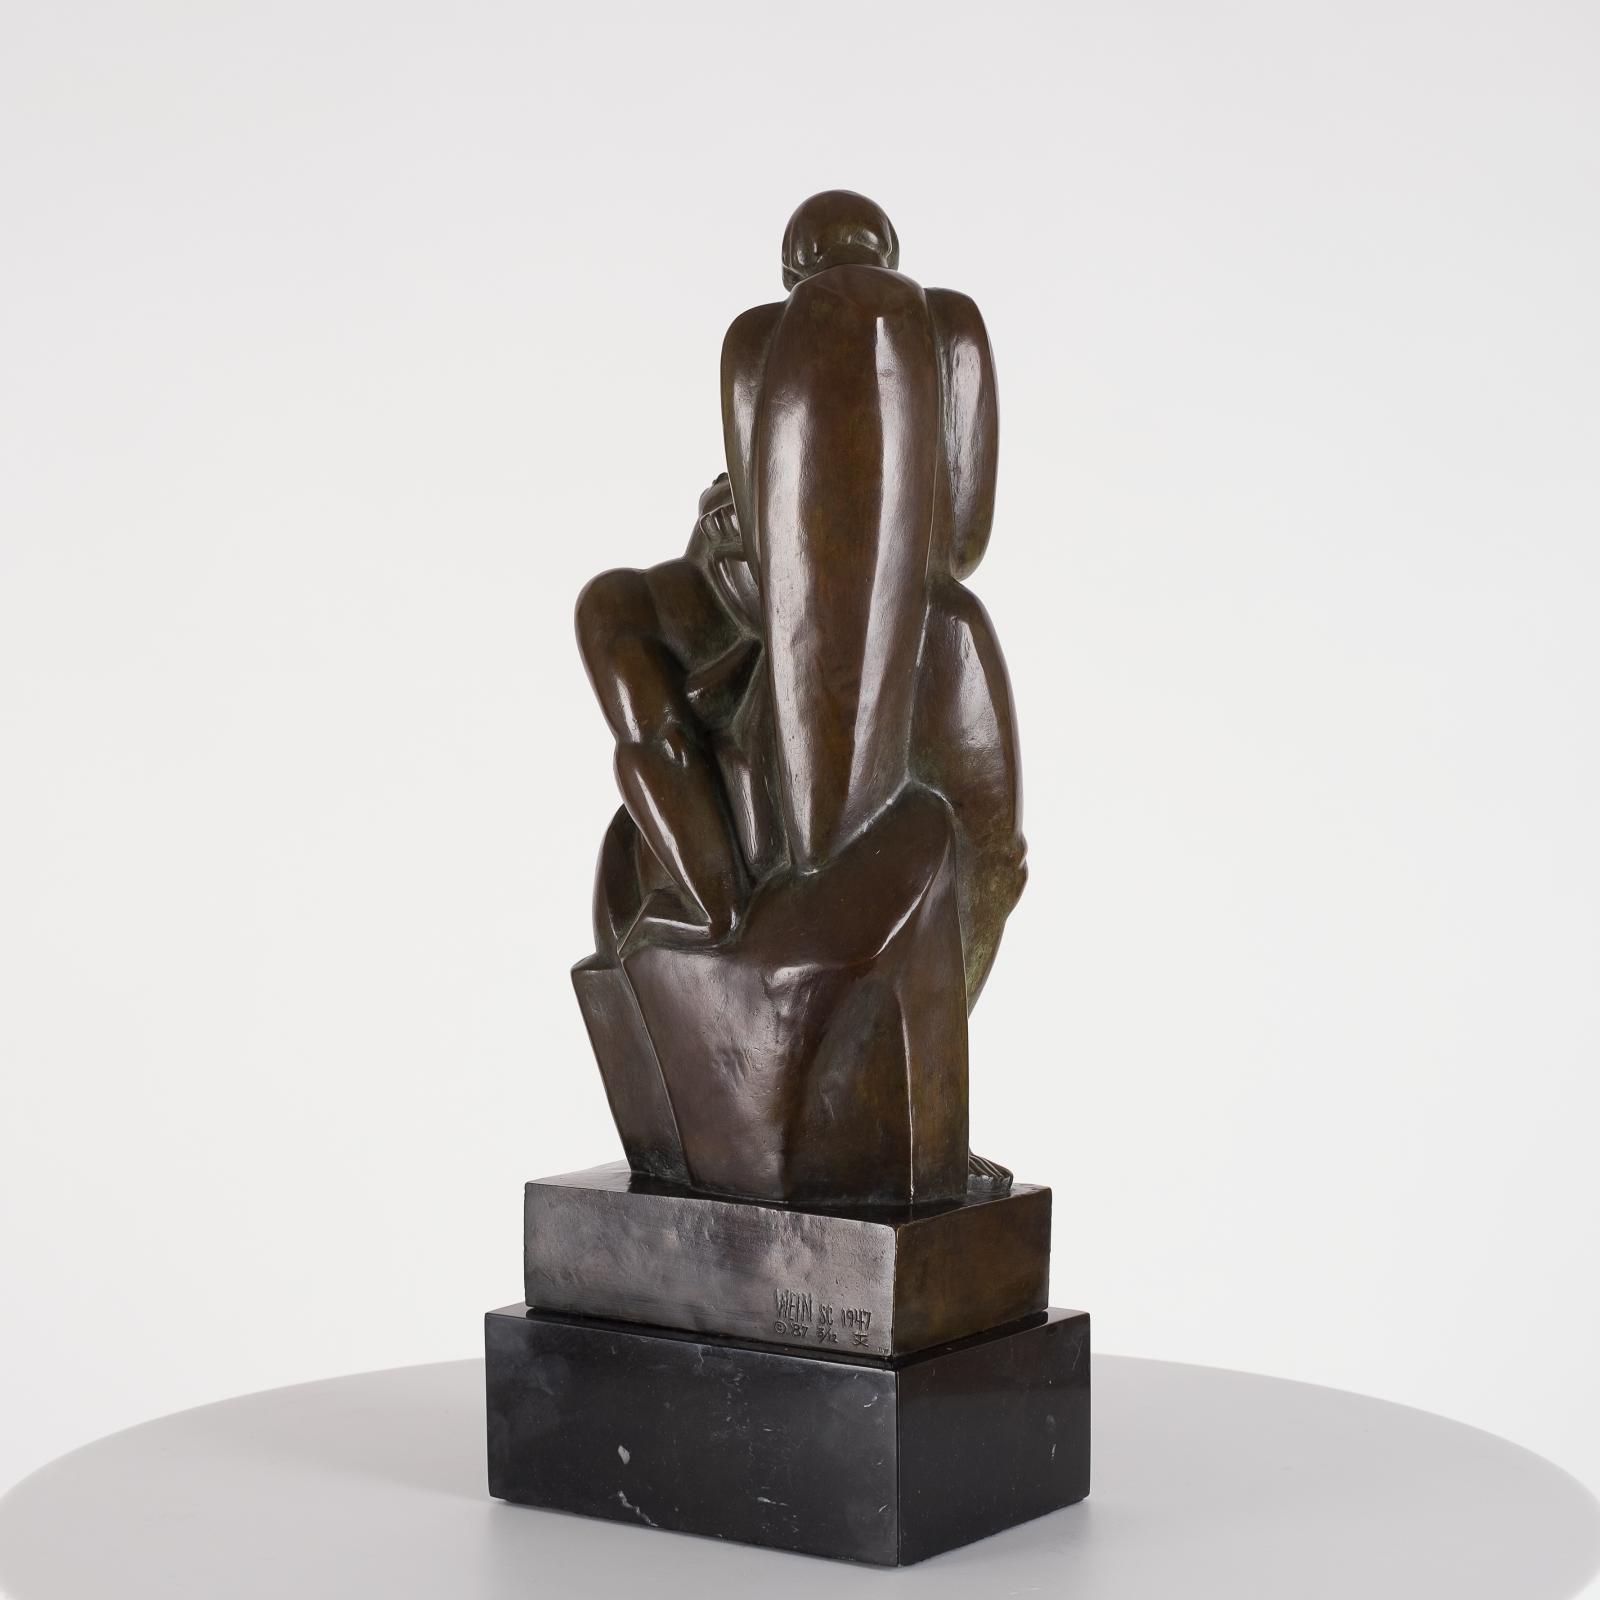 Homage to Béla Bartók